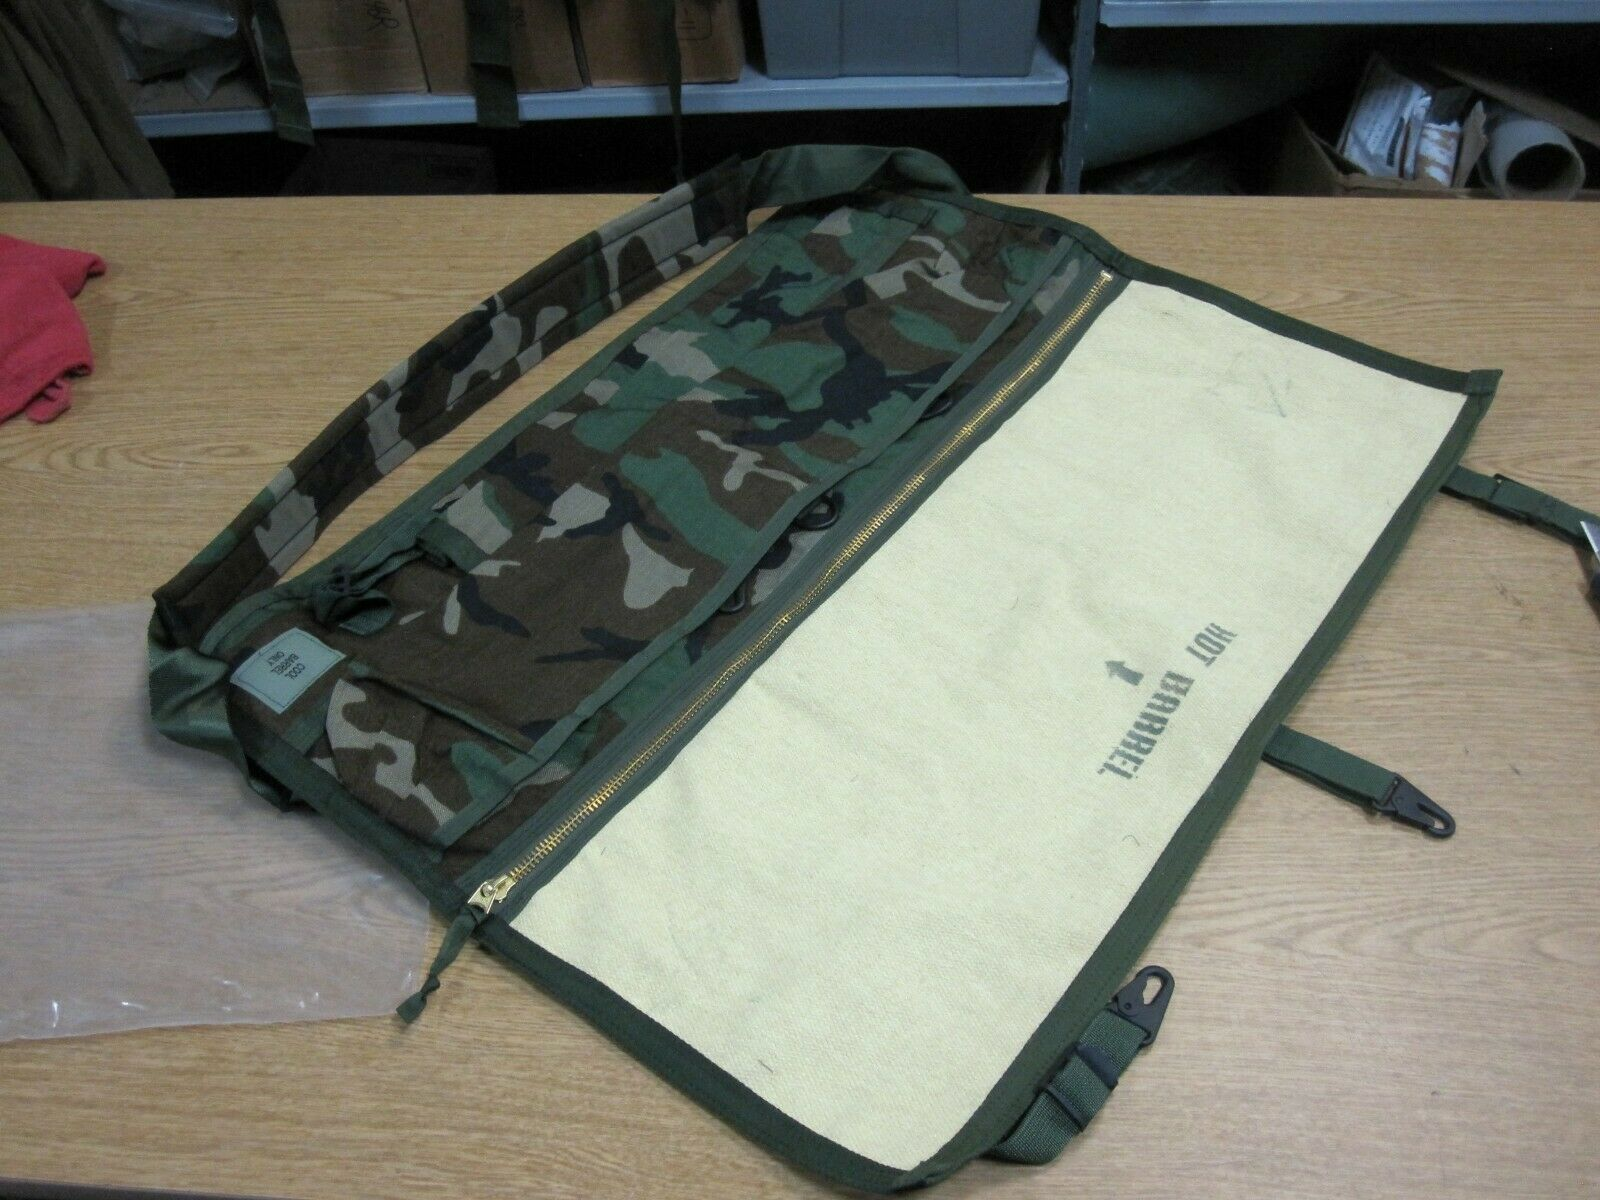 USGI Woodland Camo Spare Barrel Carrying Bag M240 HMMWV m998 Lmtv humvee 5 ton